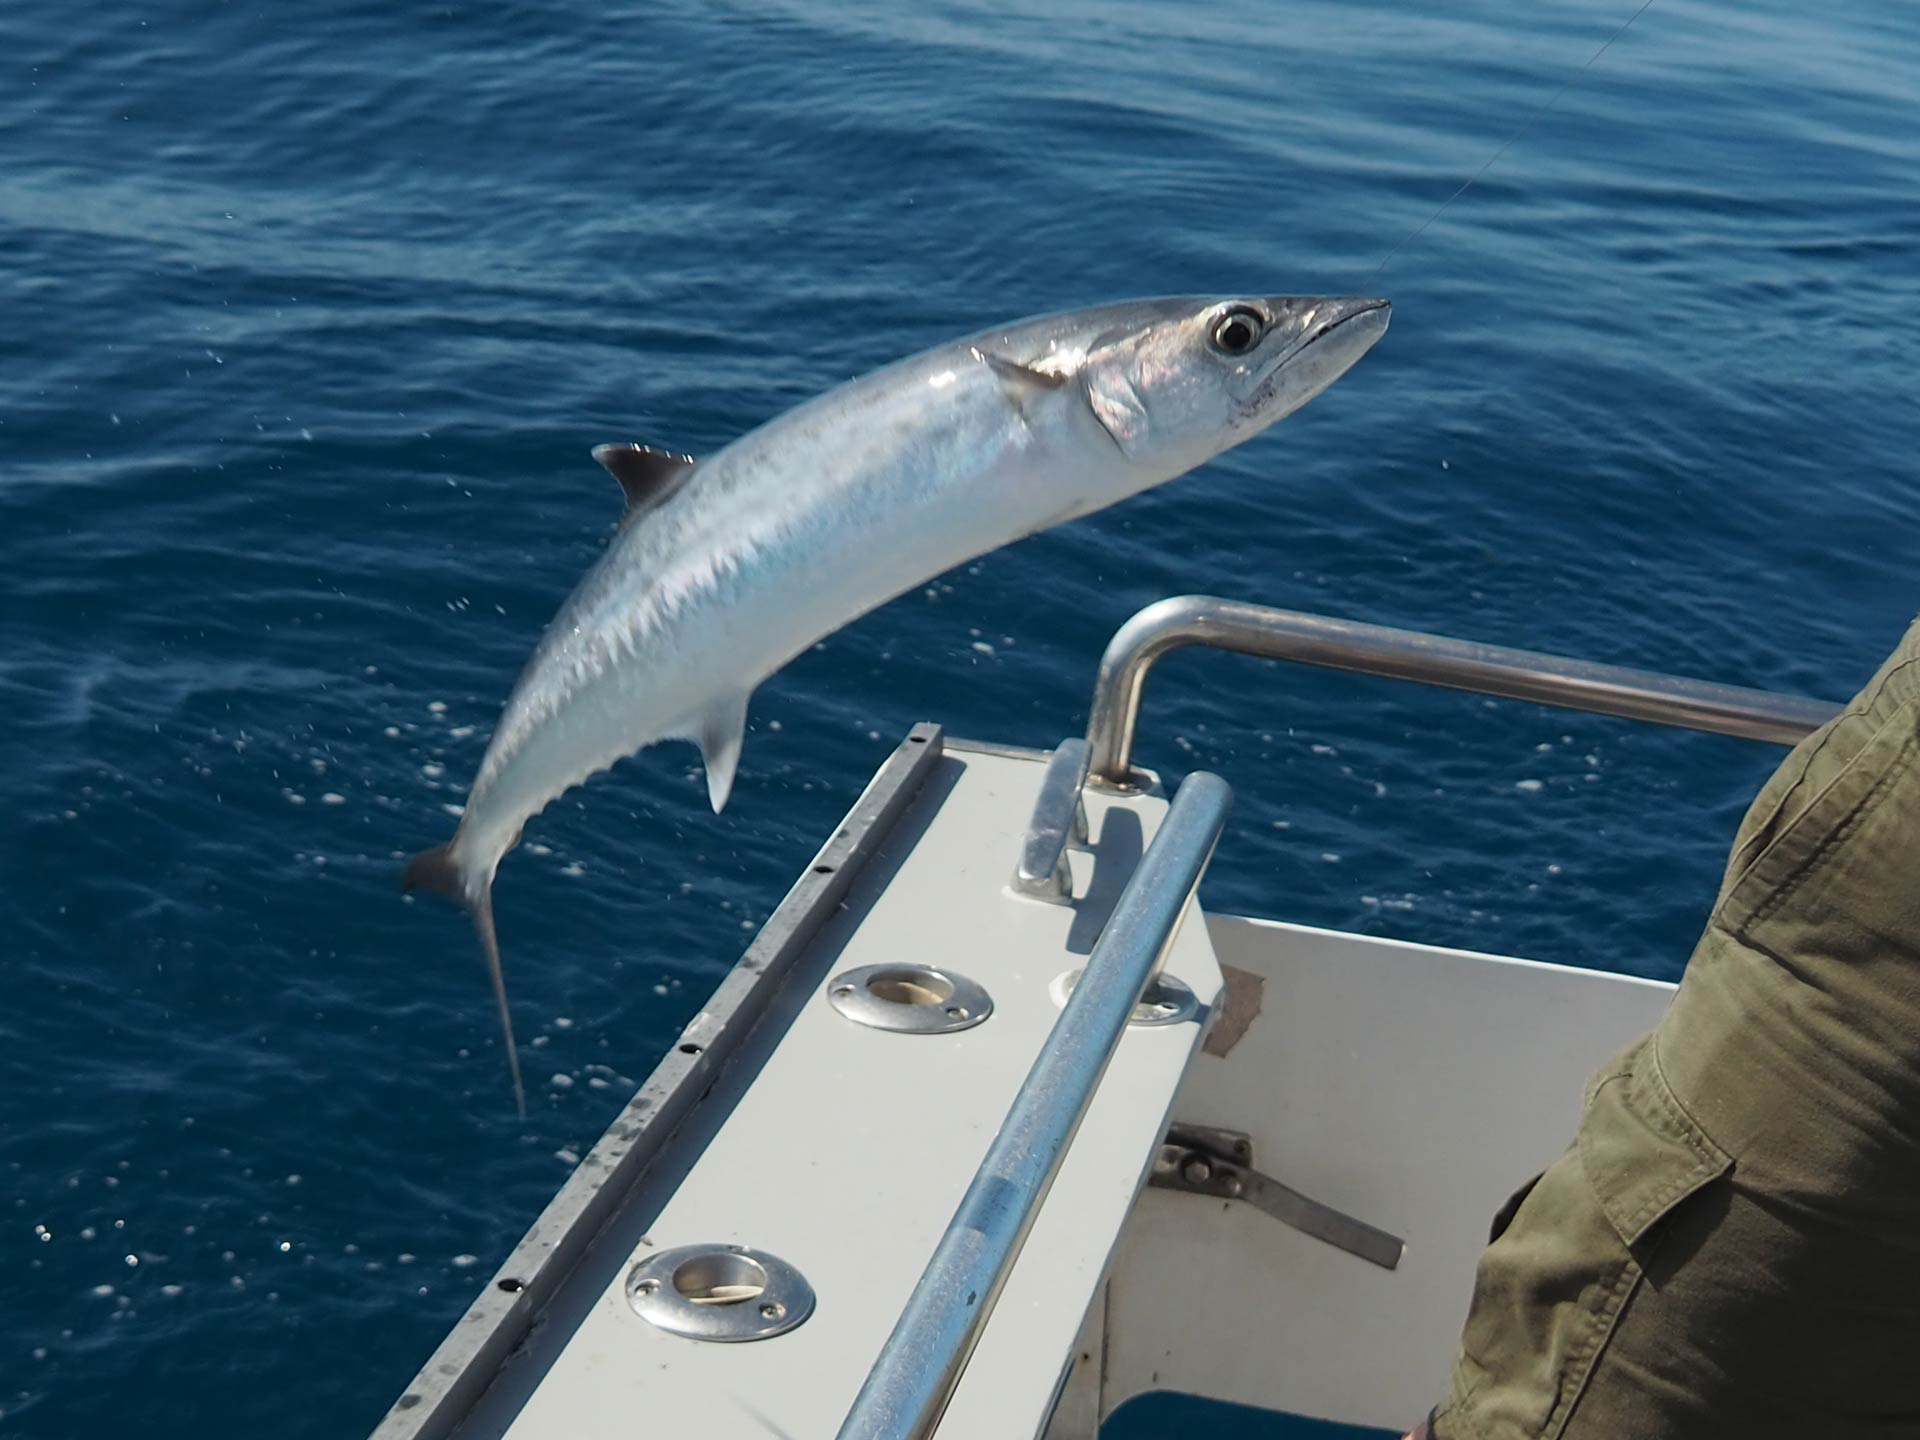 A King Mackerel jumping onto a boat